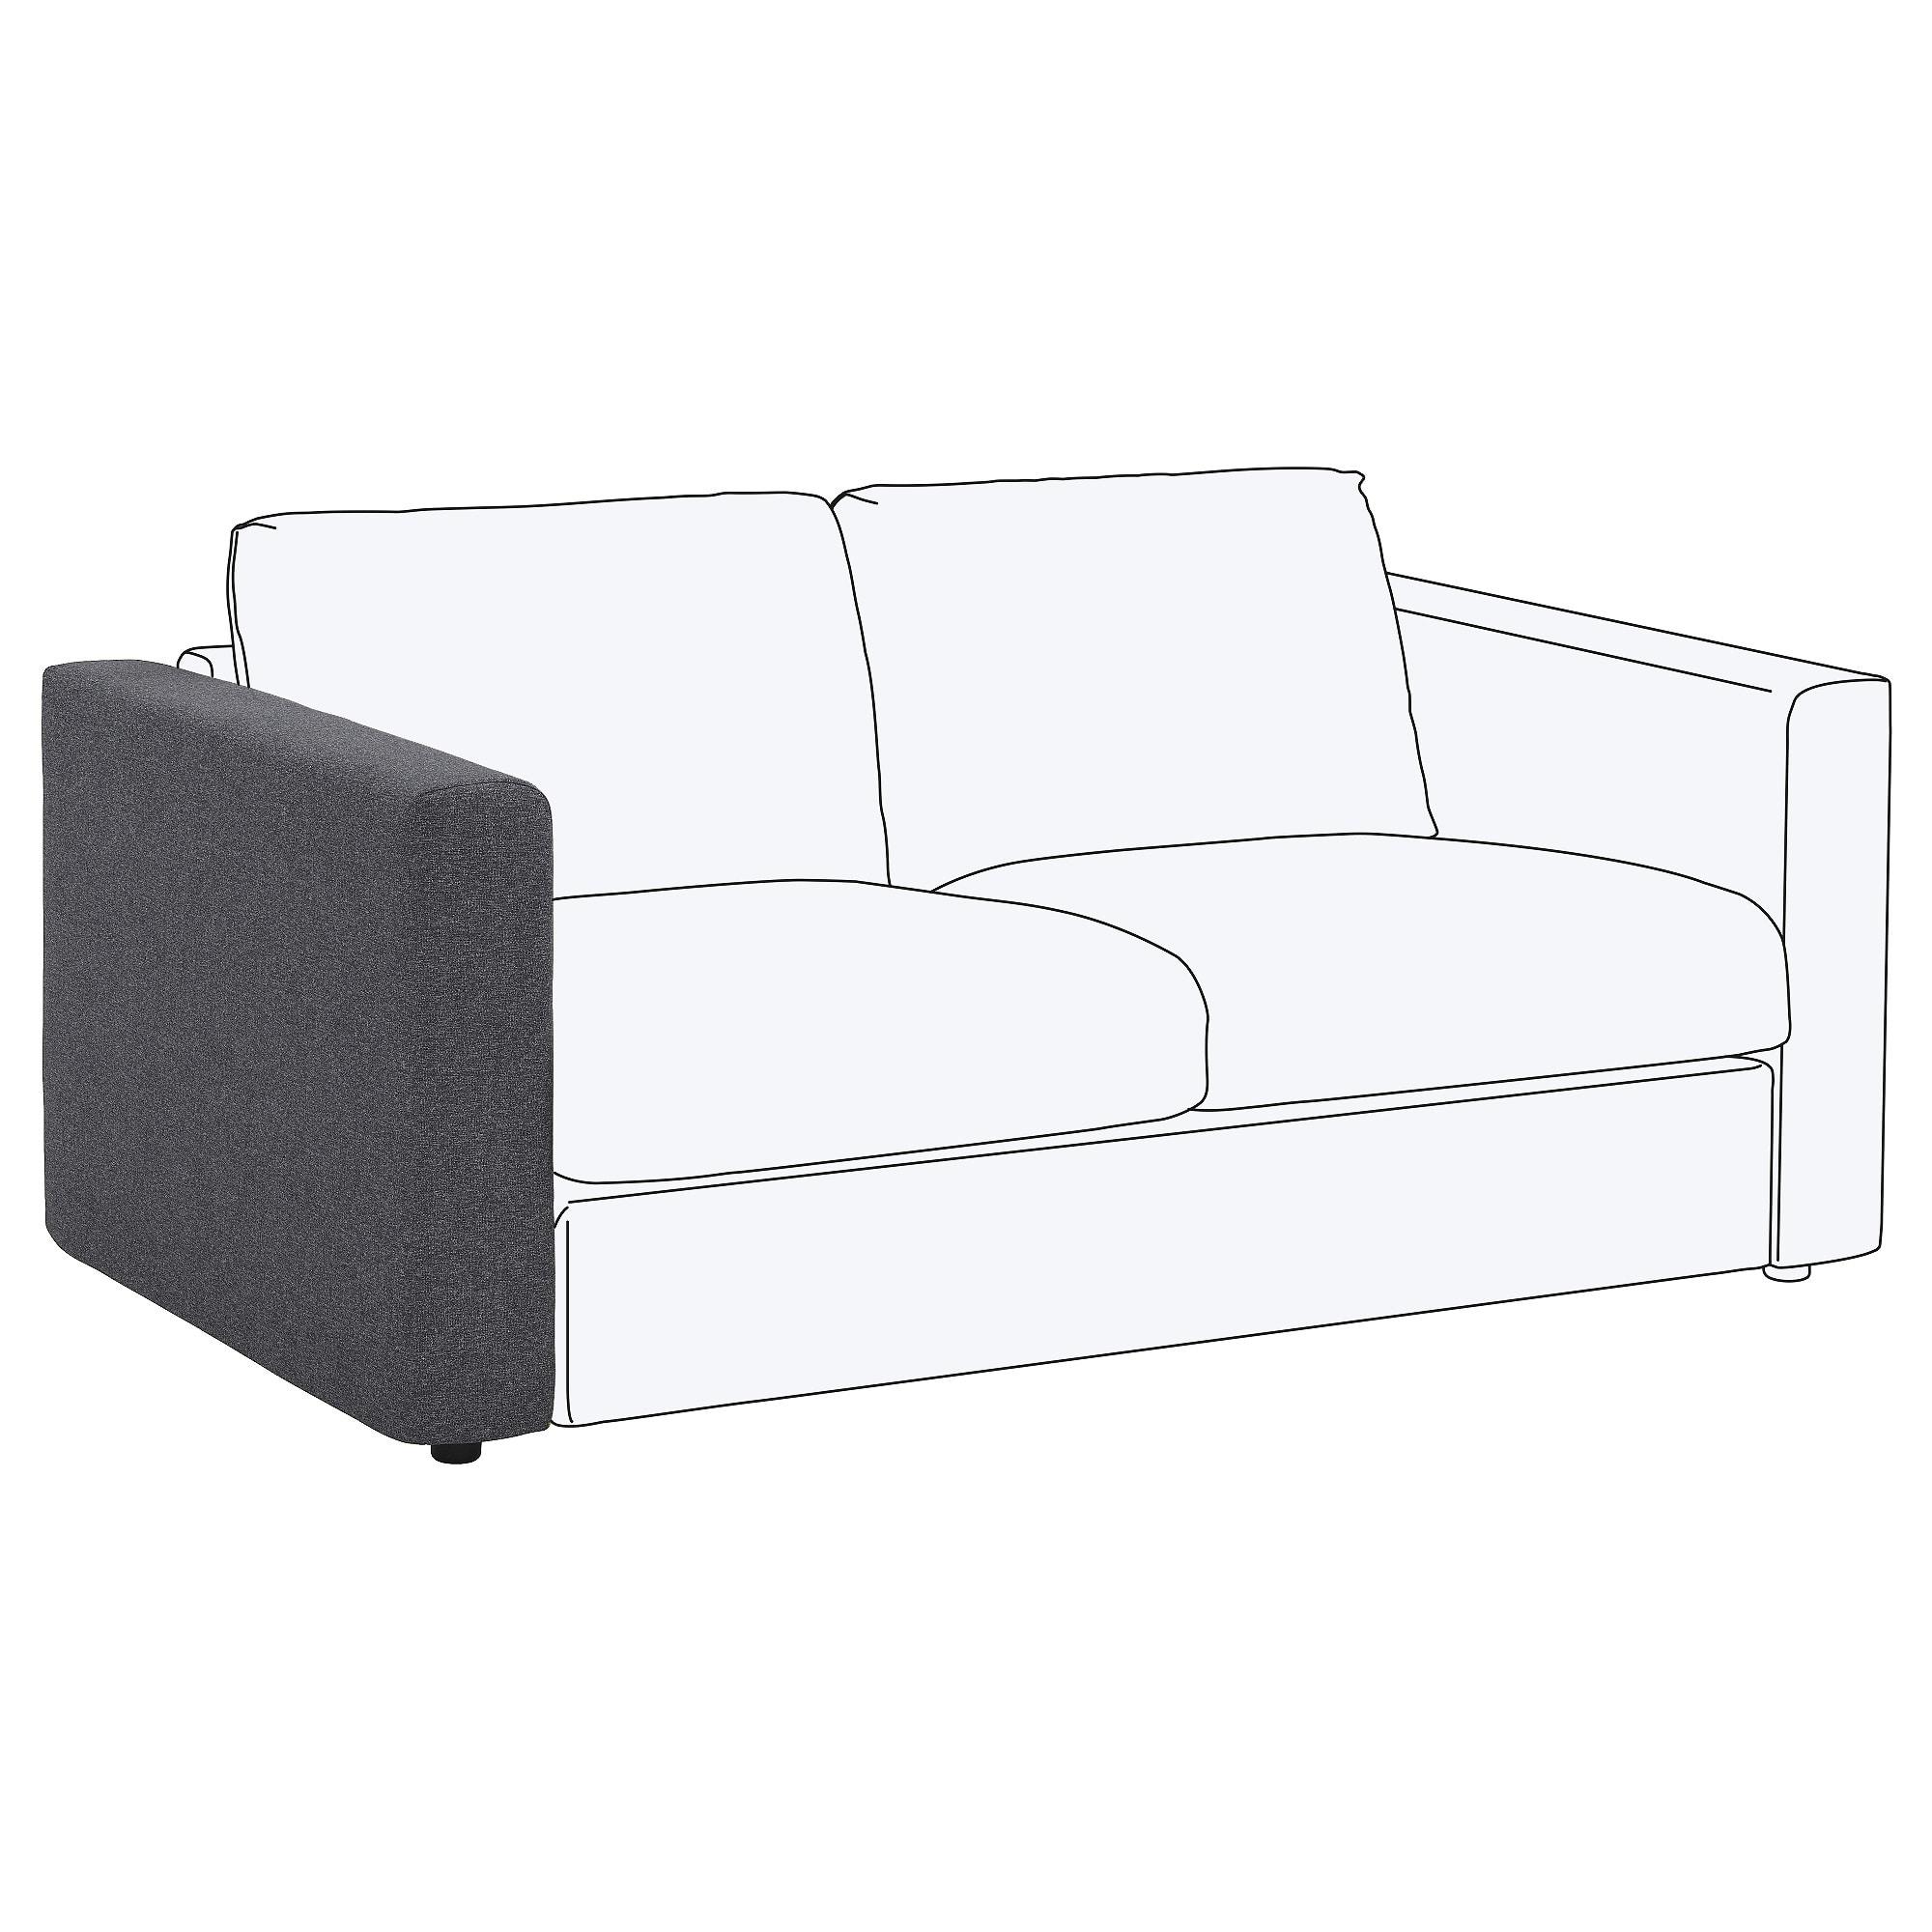 Reposabrazos sofa Bqdd Vimle Reposabrazos Gunnared Gris Ikea